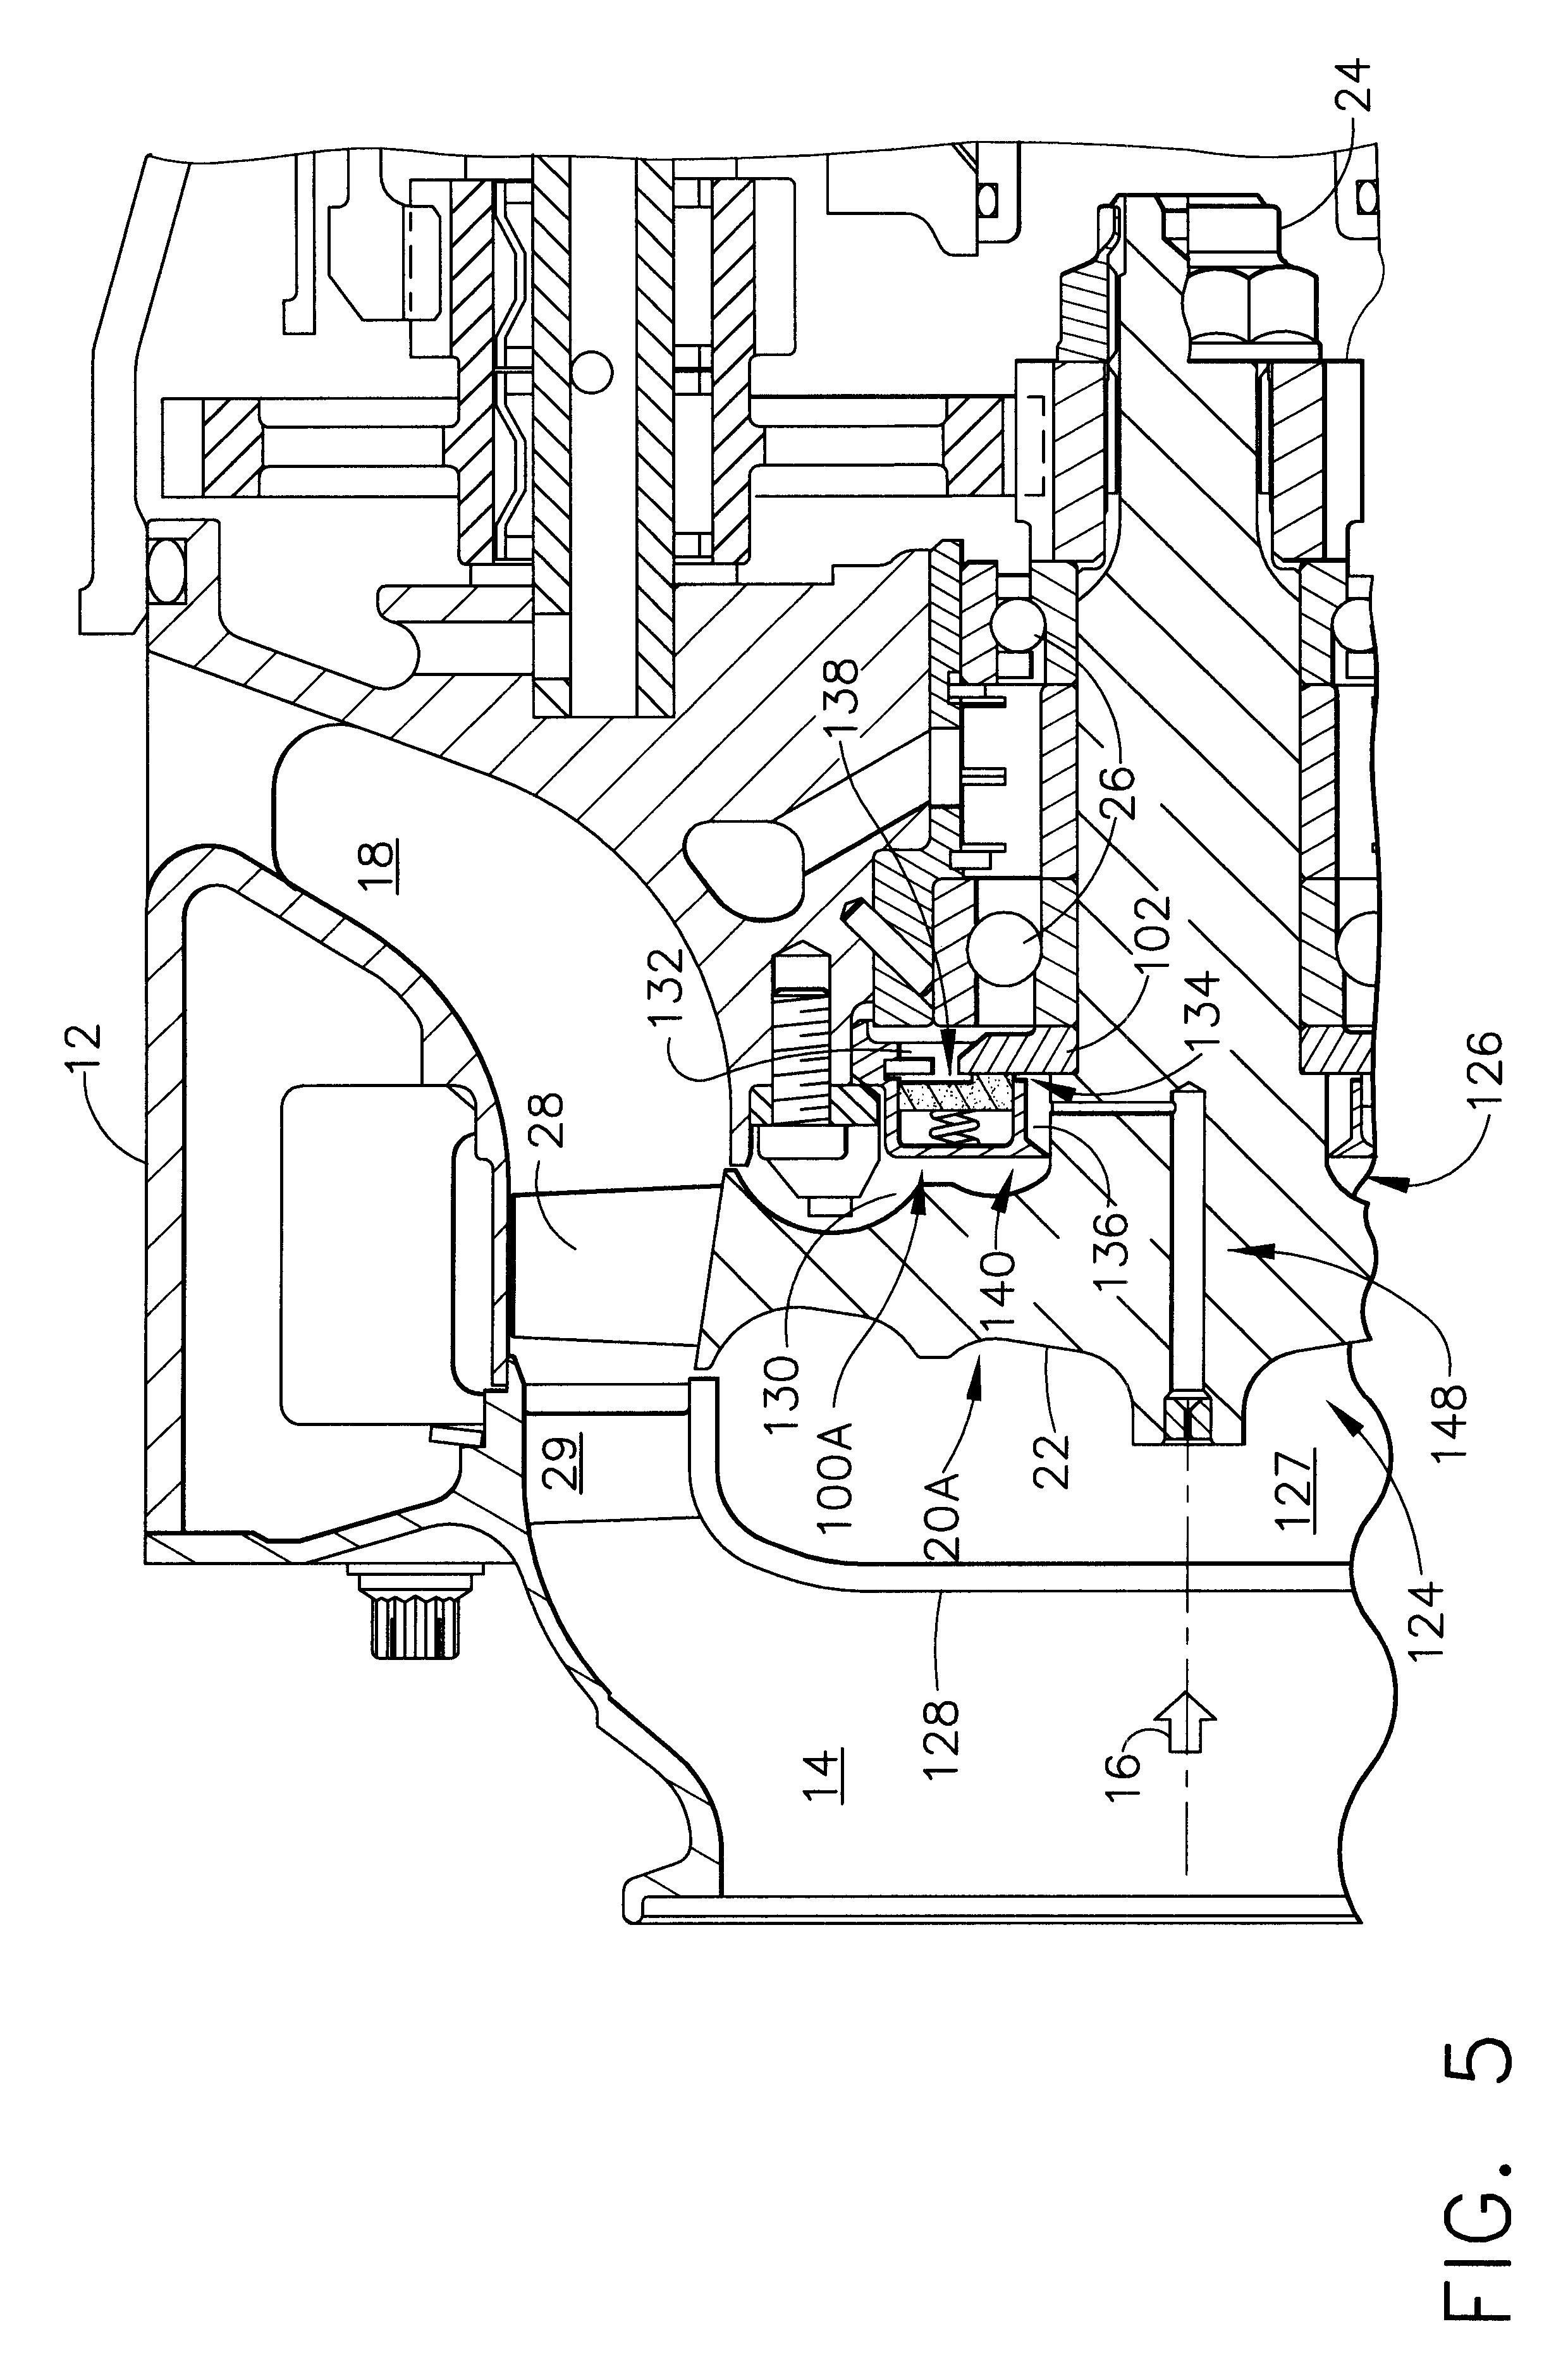 Fine 4l80e Wiring Harness Diagram Gift - Electrical Diagram Ideas ...